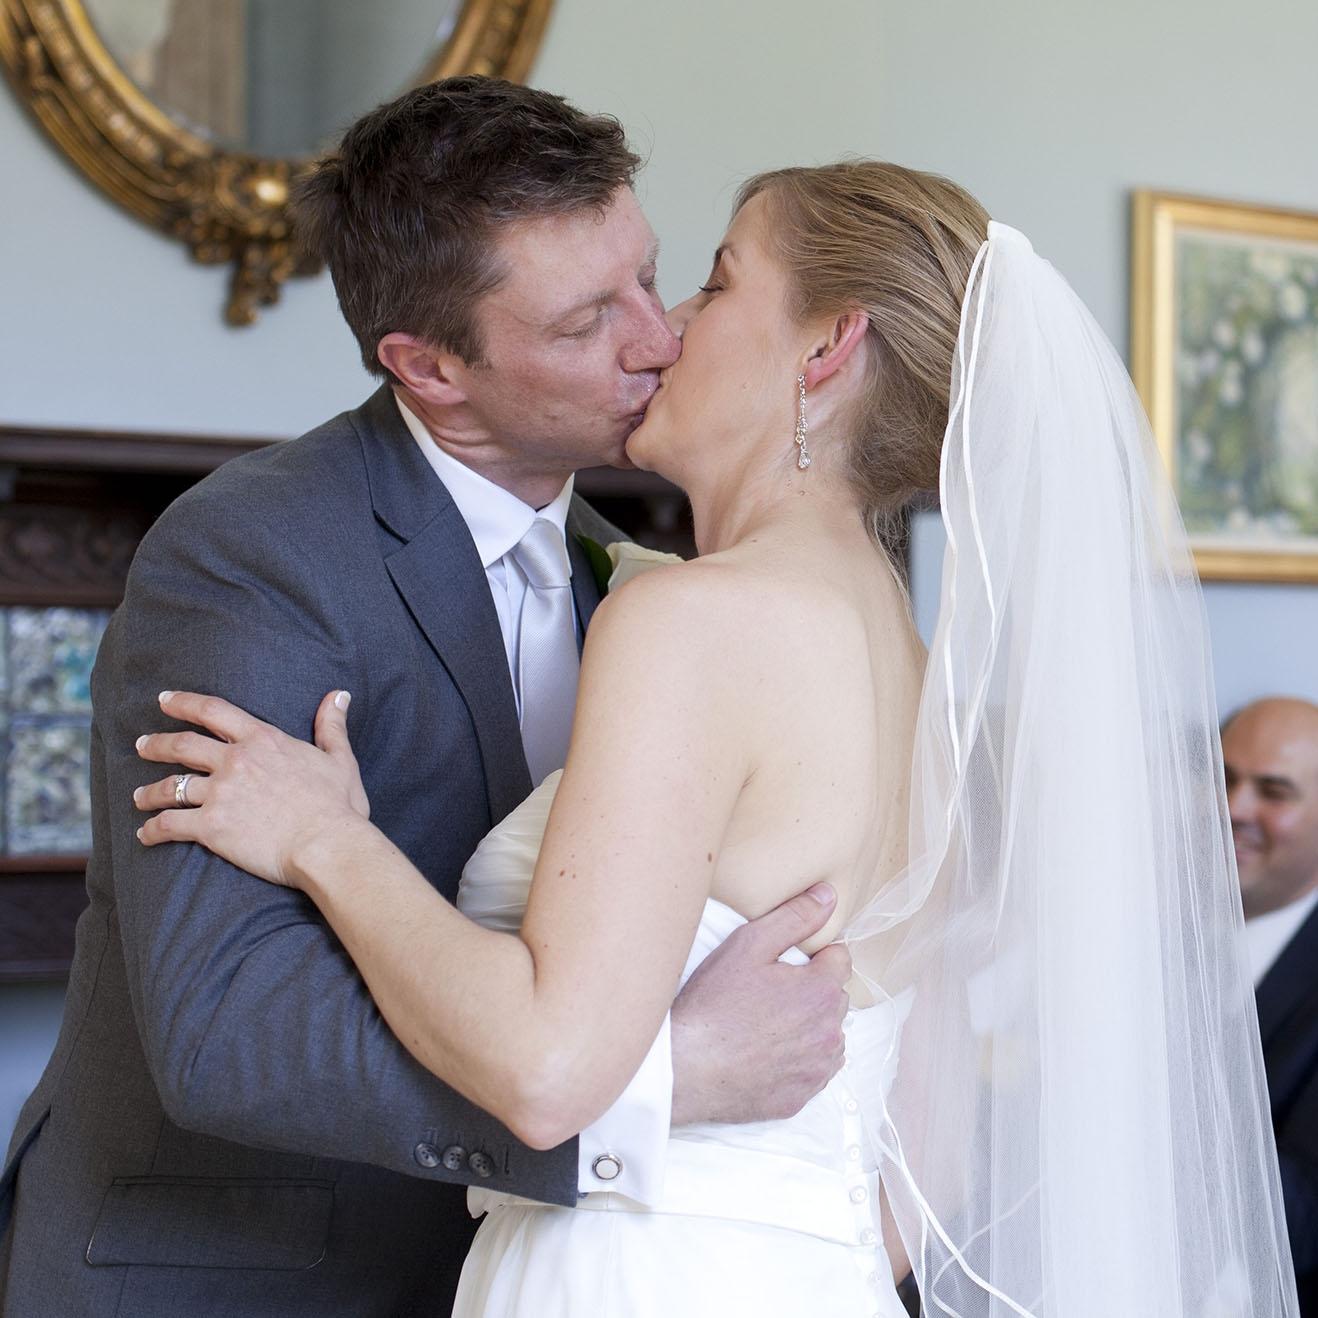 elizabethg_fineart_photography_hertfordshire_rachel_adam_wedding_highelmsmanor_25.jpg